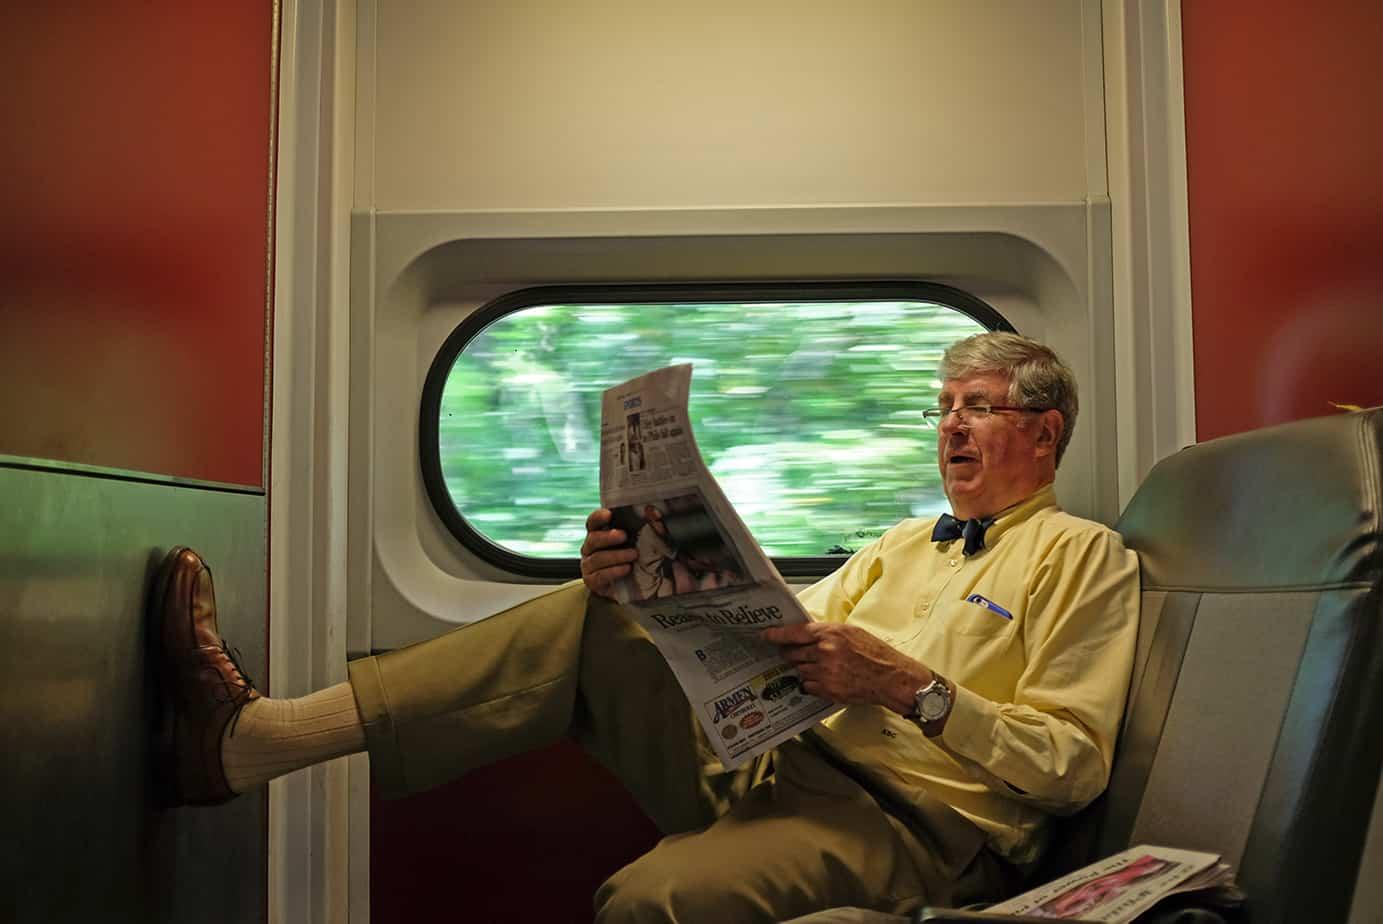 man riding train, reading a newspaper